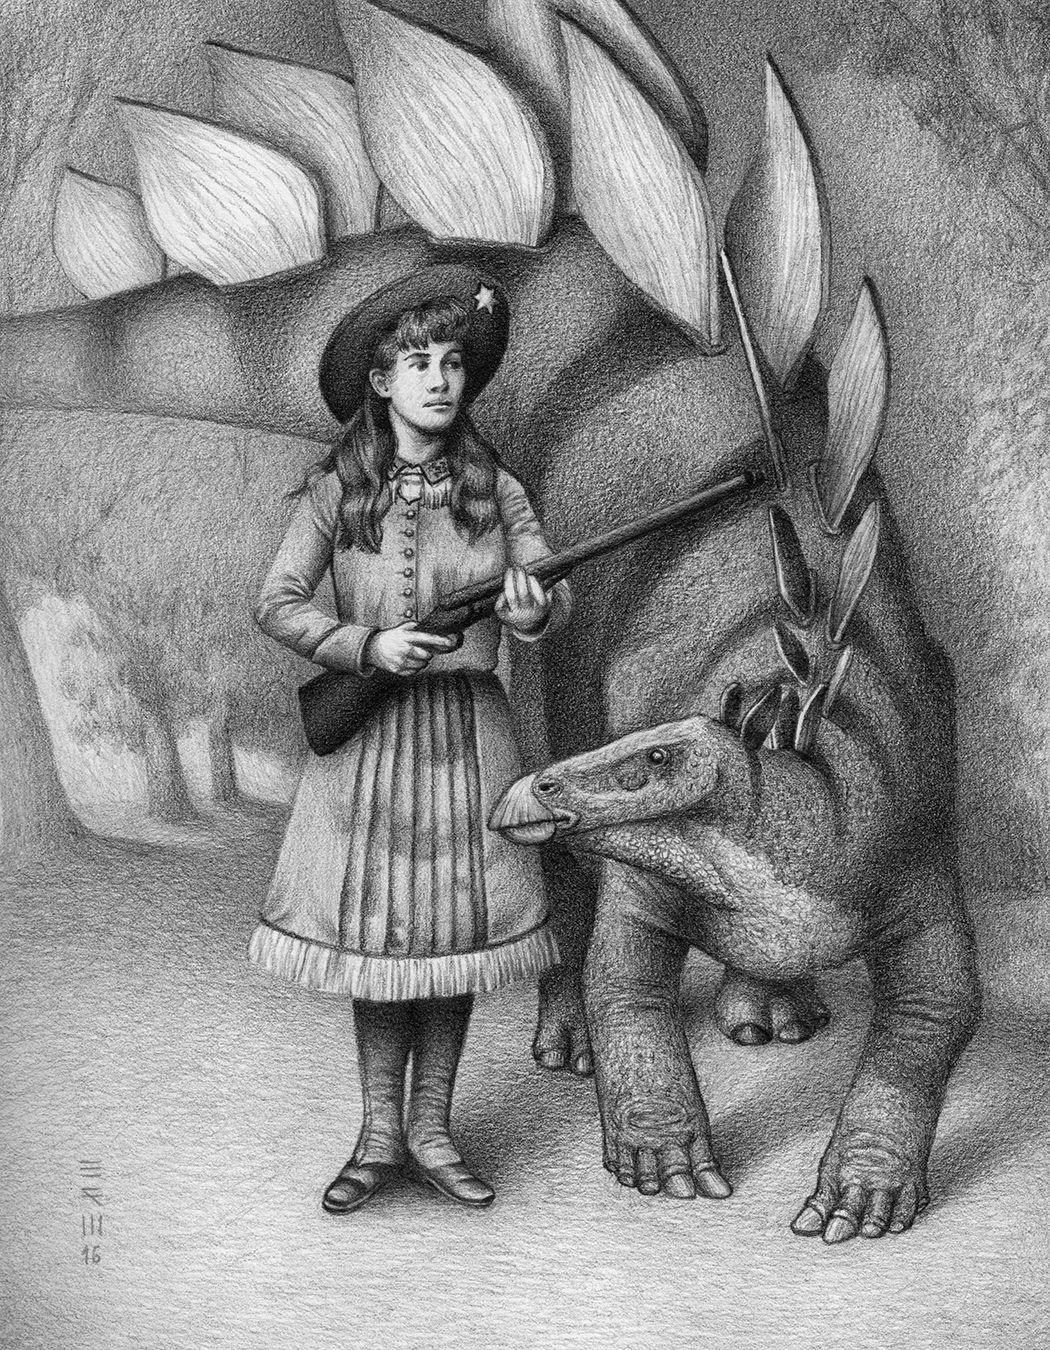 Image of Annie Oakley & Stegosaurus